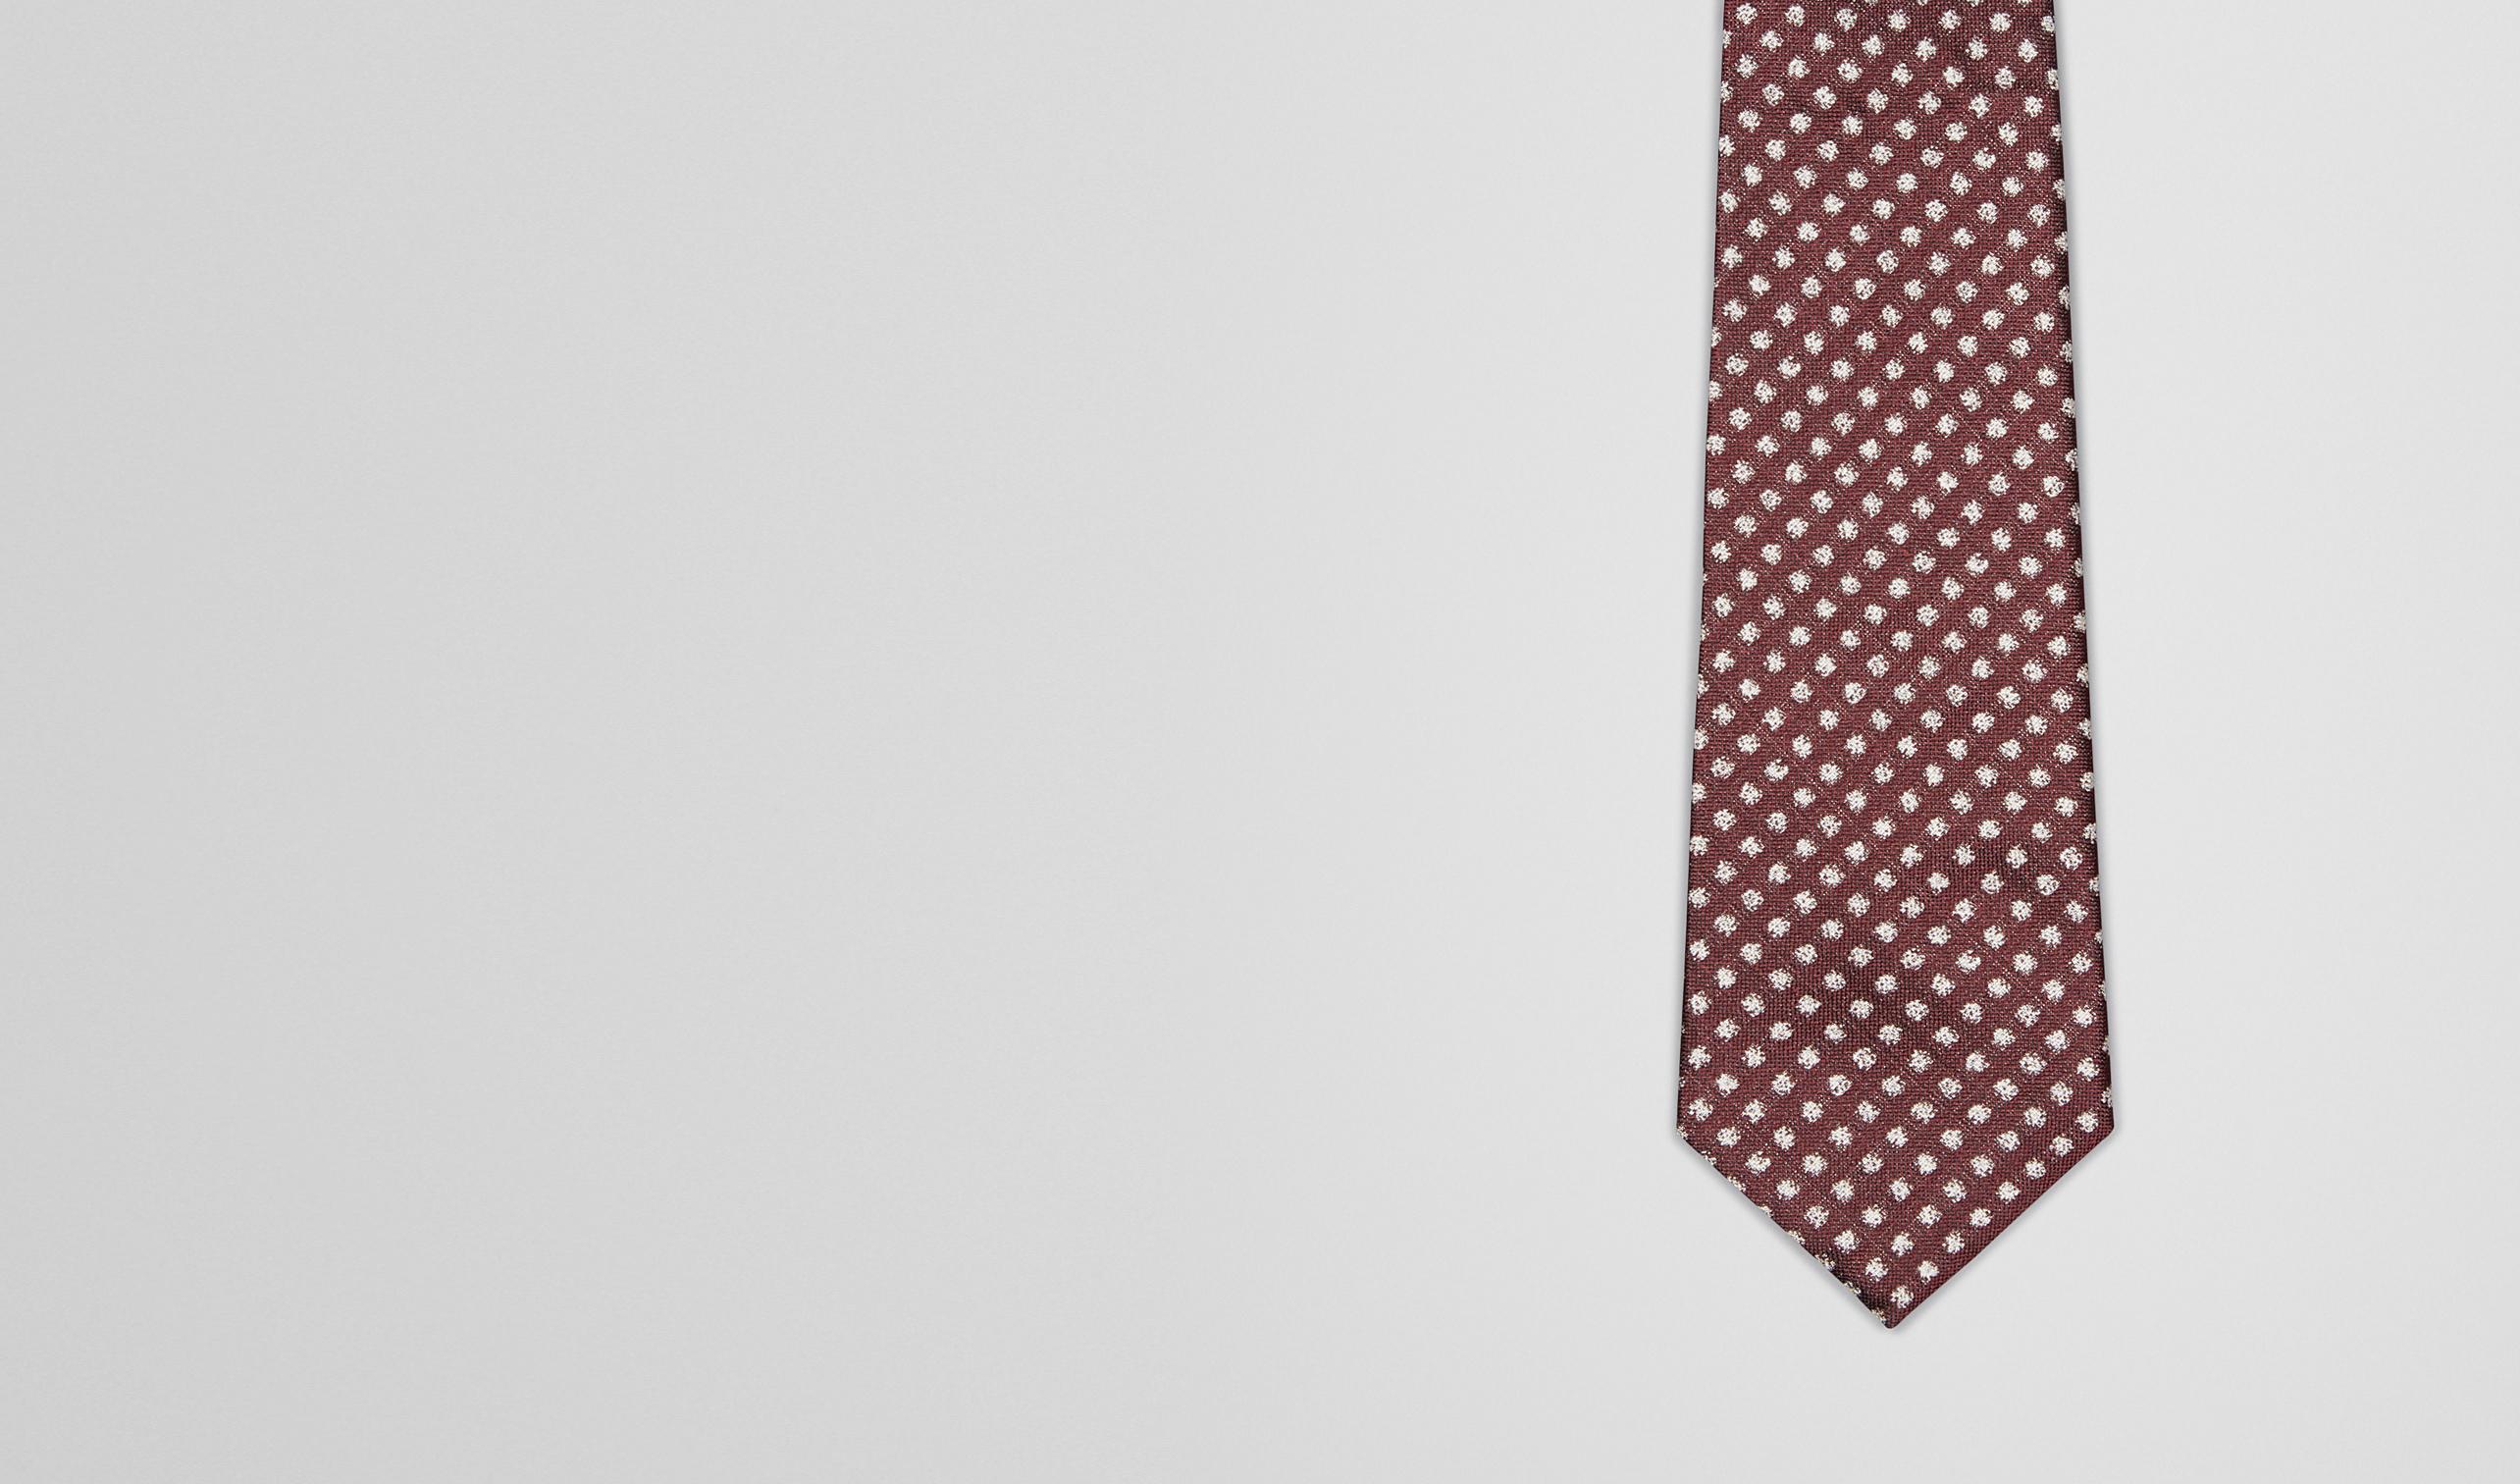 BOTTEGA VENETA Tie U Bordeaux Beige Silk Tie pl